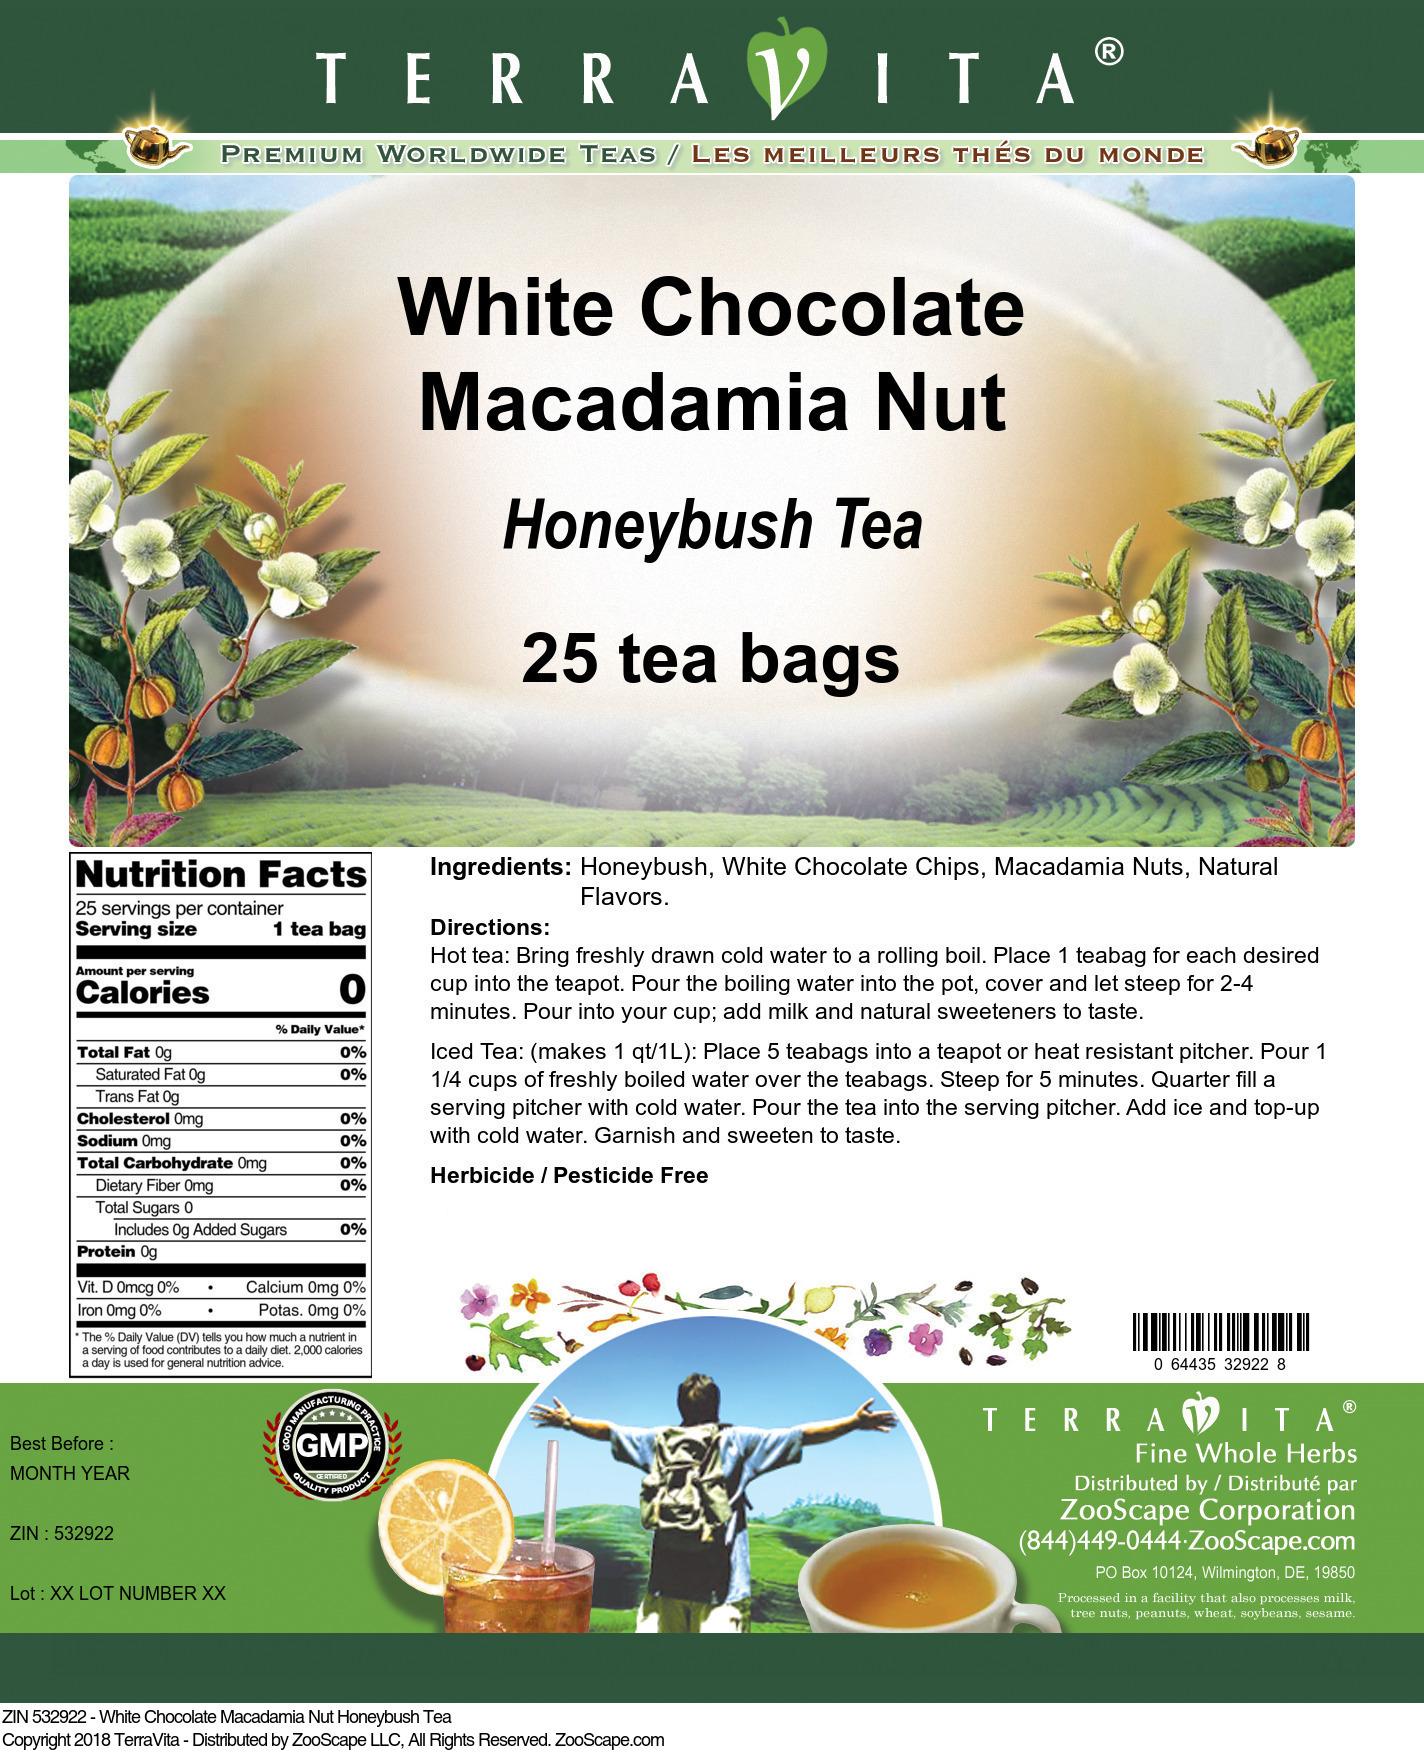 White Chocolate Macadamia Nut Honeybush Tea